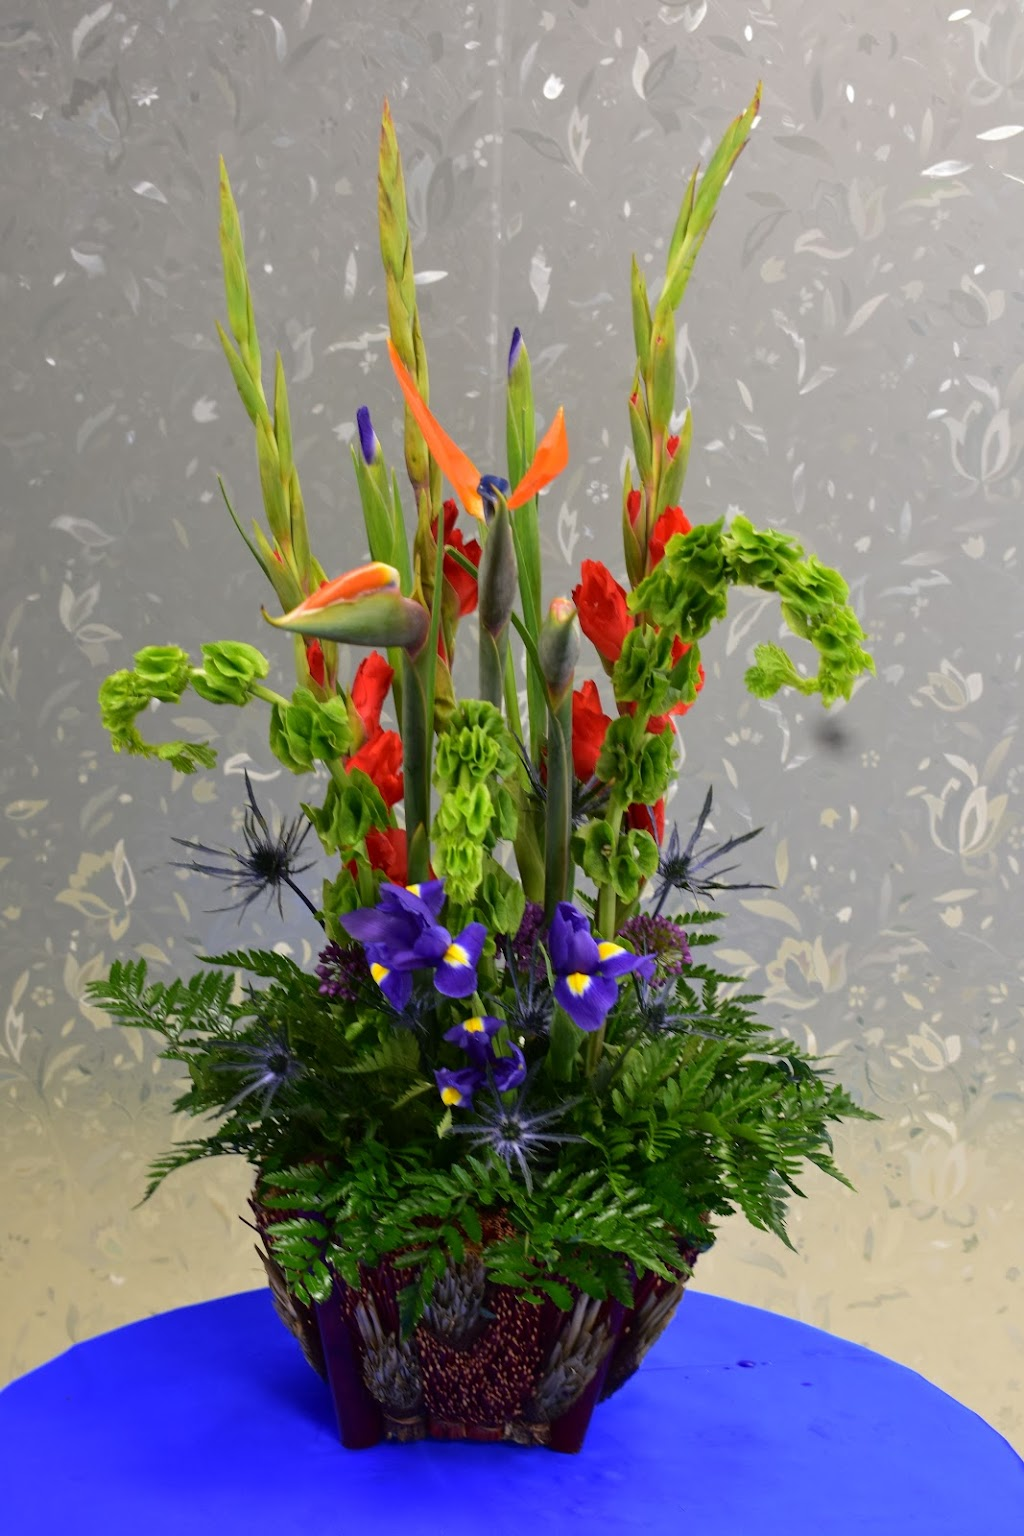 The Queens Florist   florist   186 Church St, Liverpool, NS B0T 1K0, Canada   9023433569 OR +1 902-343-3569